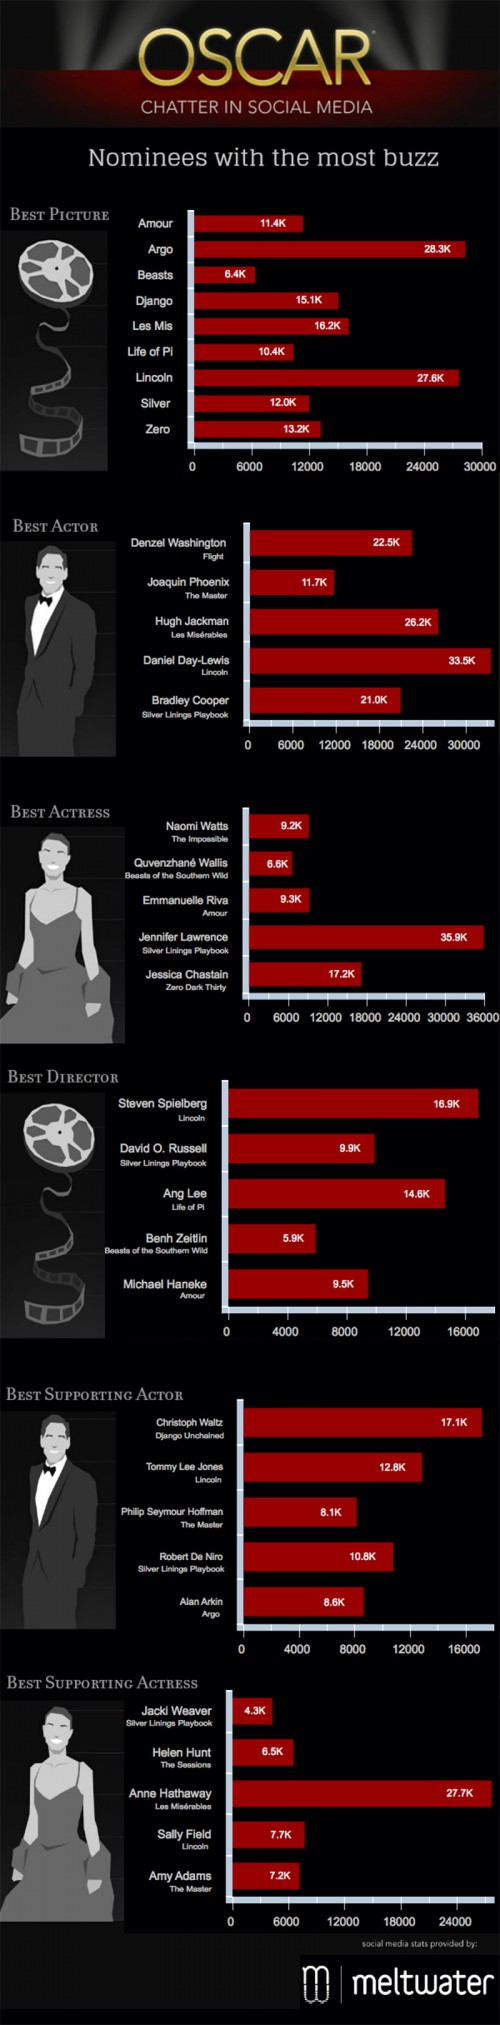 OscarsInfographic2013